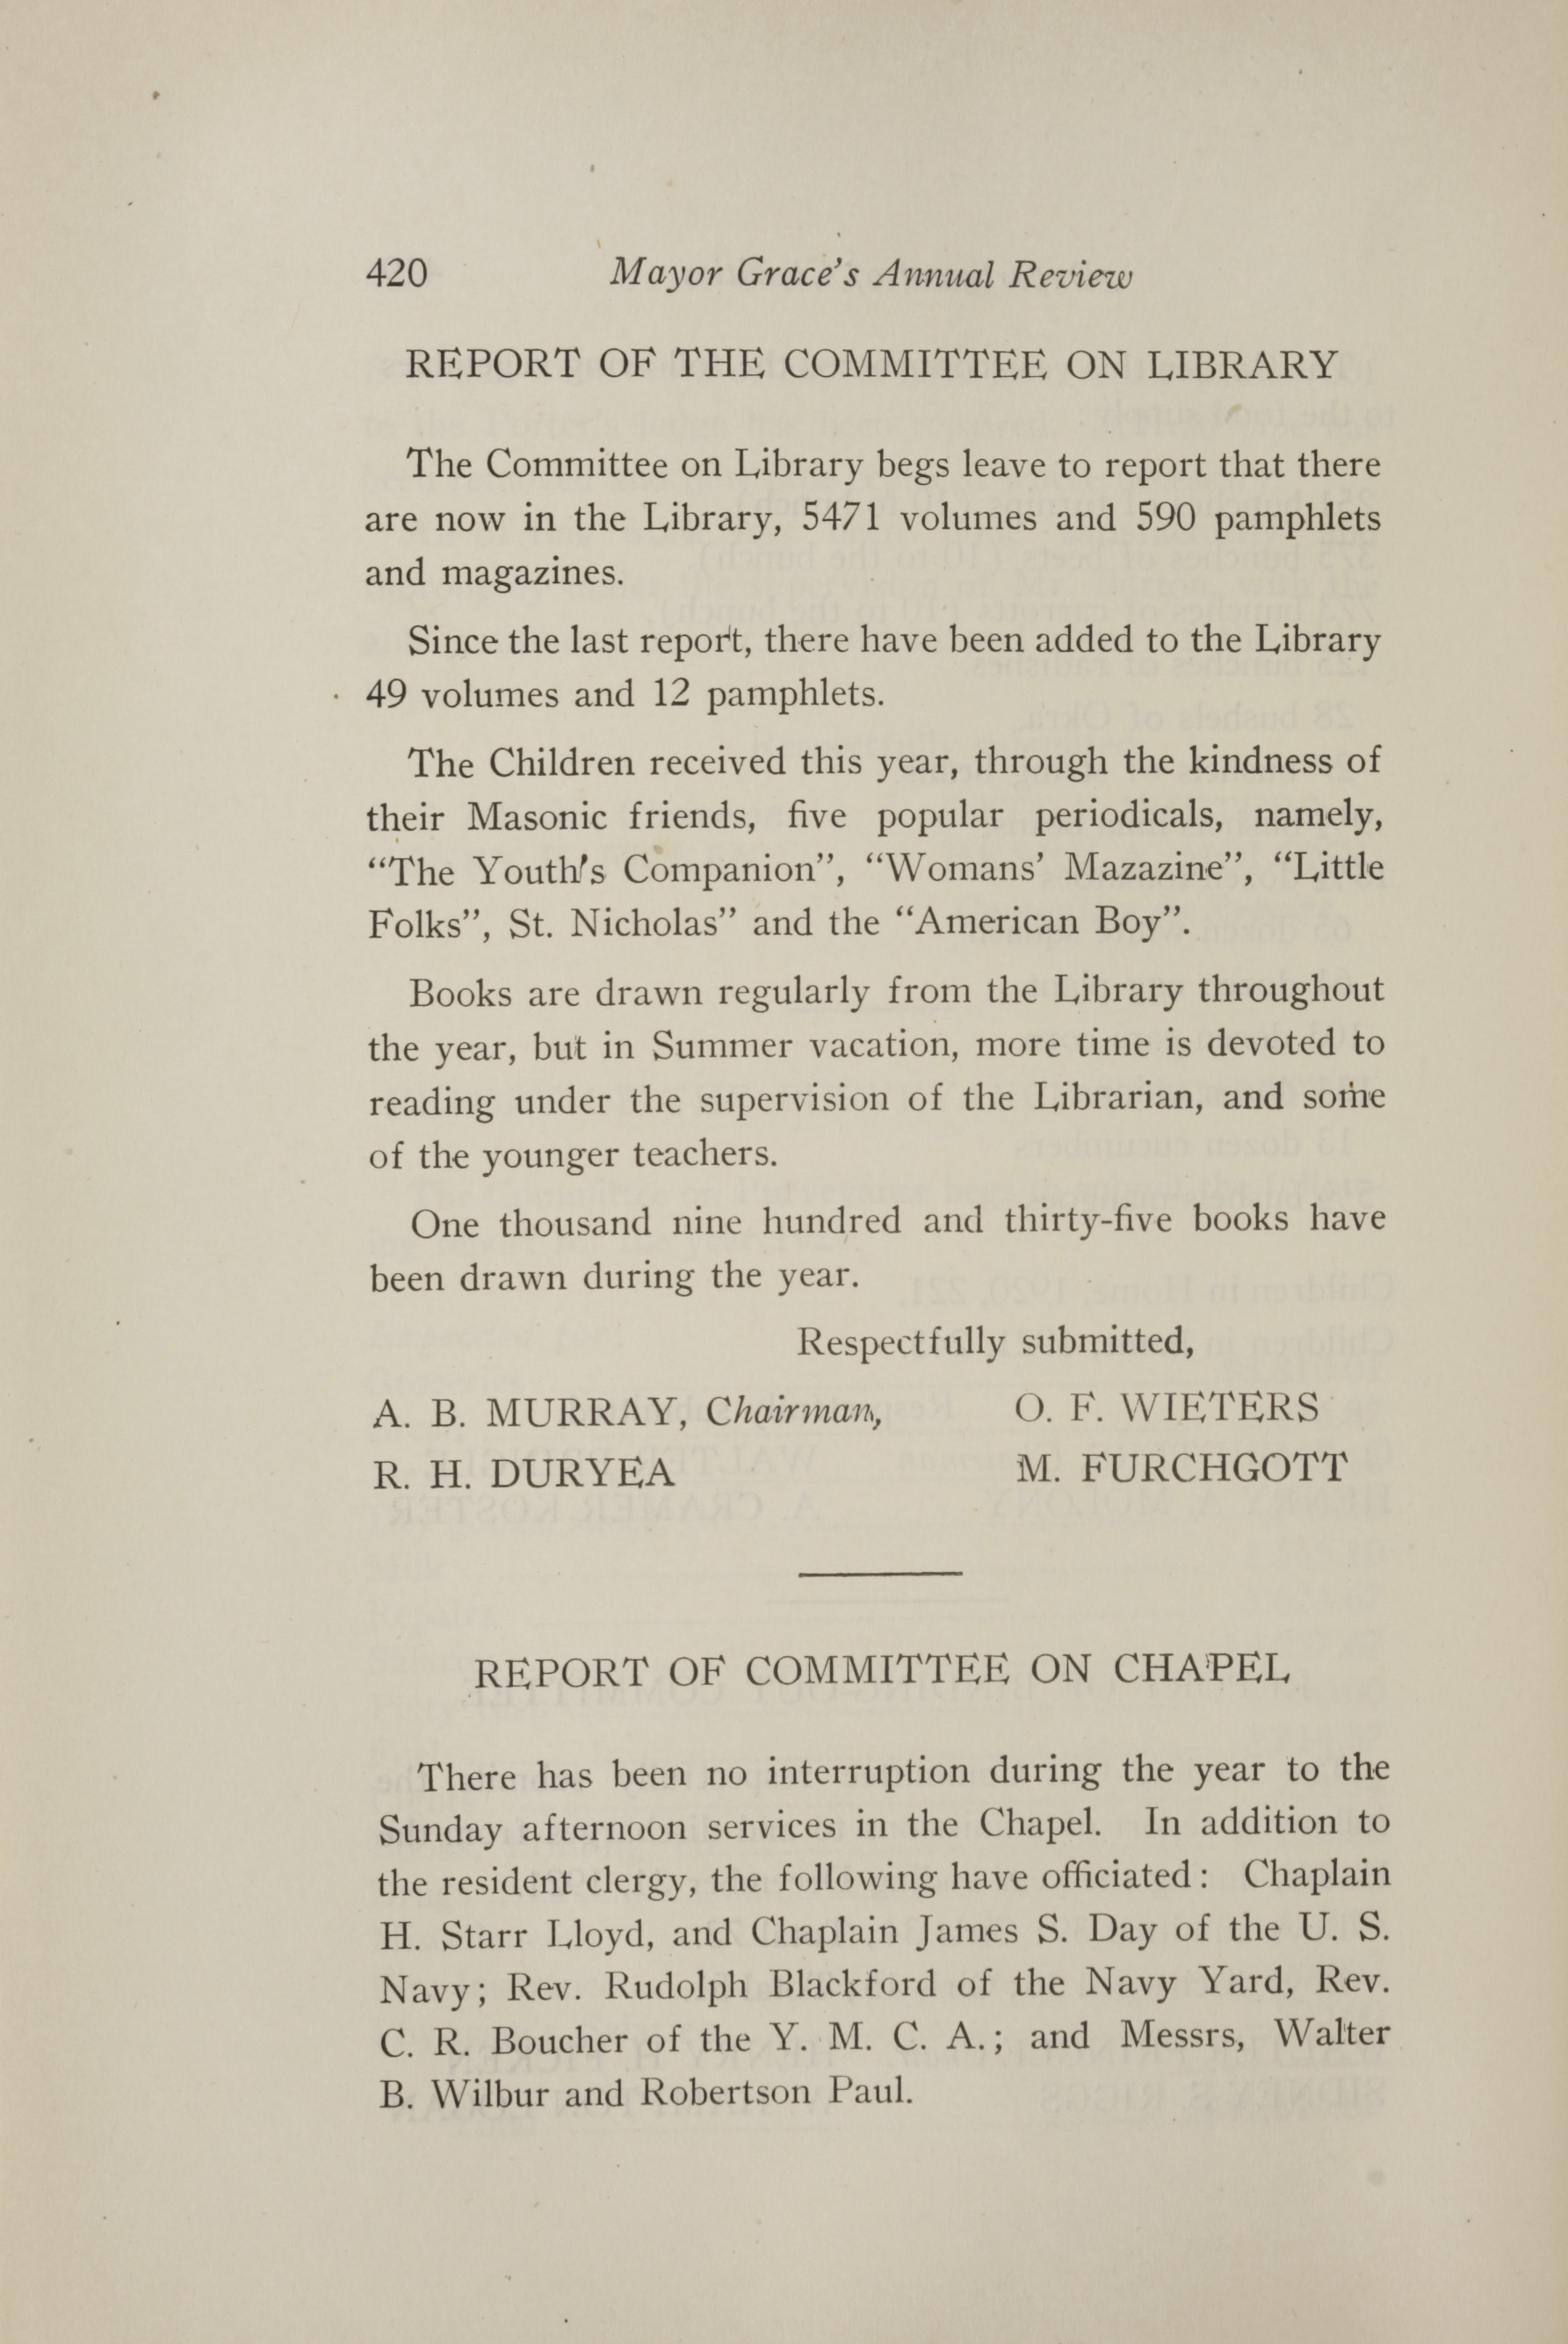 Charleston Yearbook, 1921, page 420